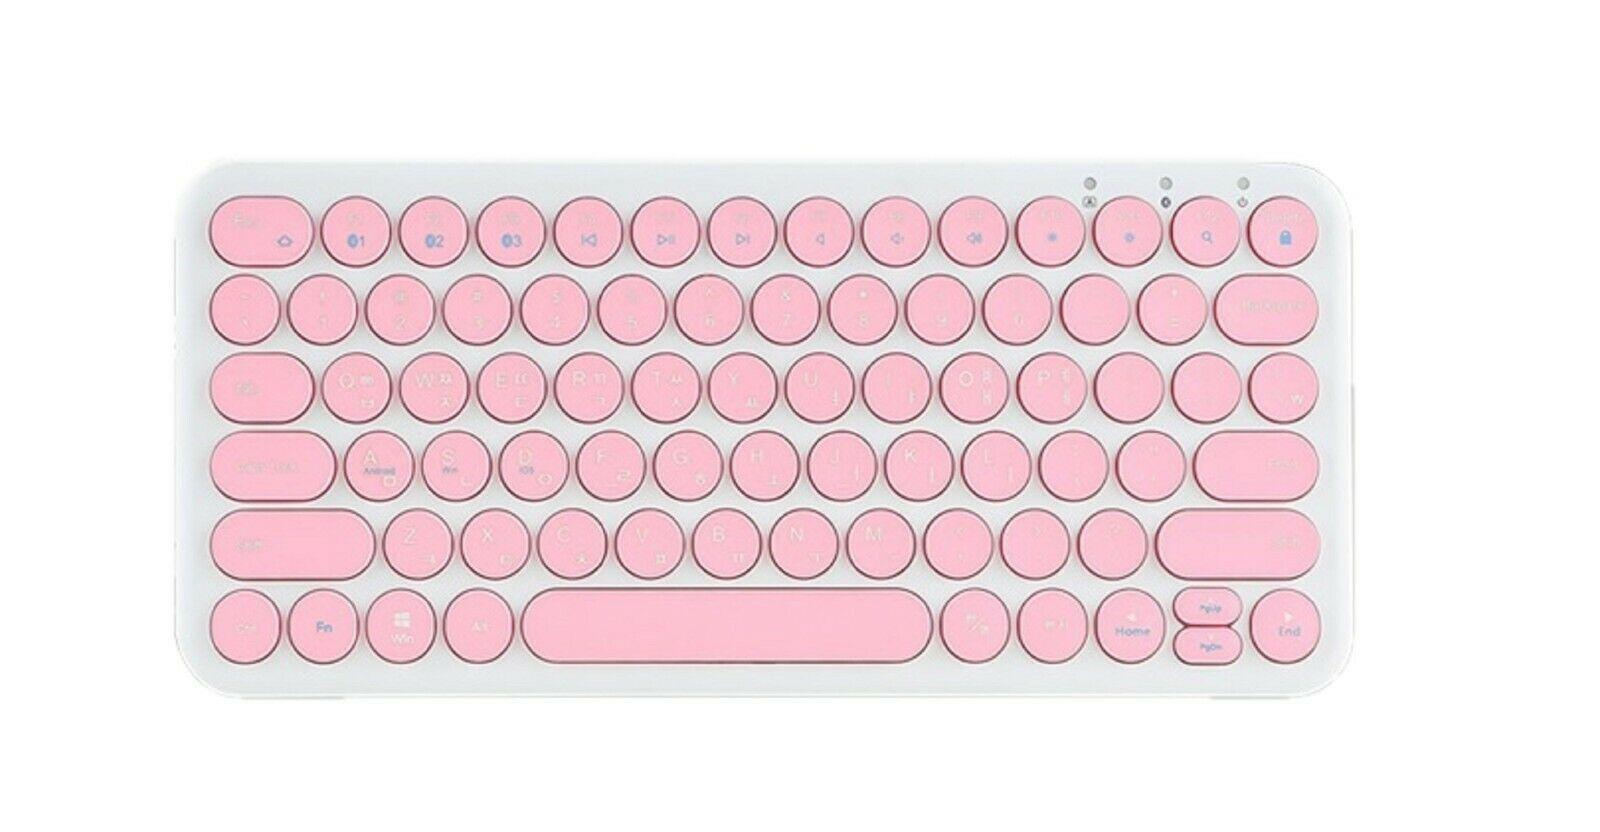 inote Korean English Bluetooth Slim Keyboard Wireless Compact Mini (Pink)